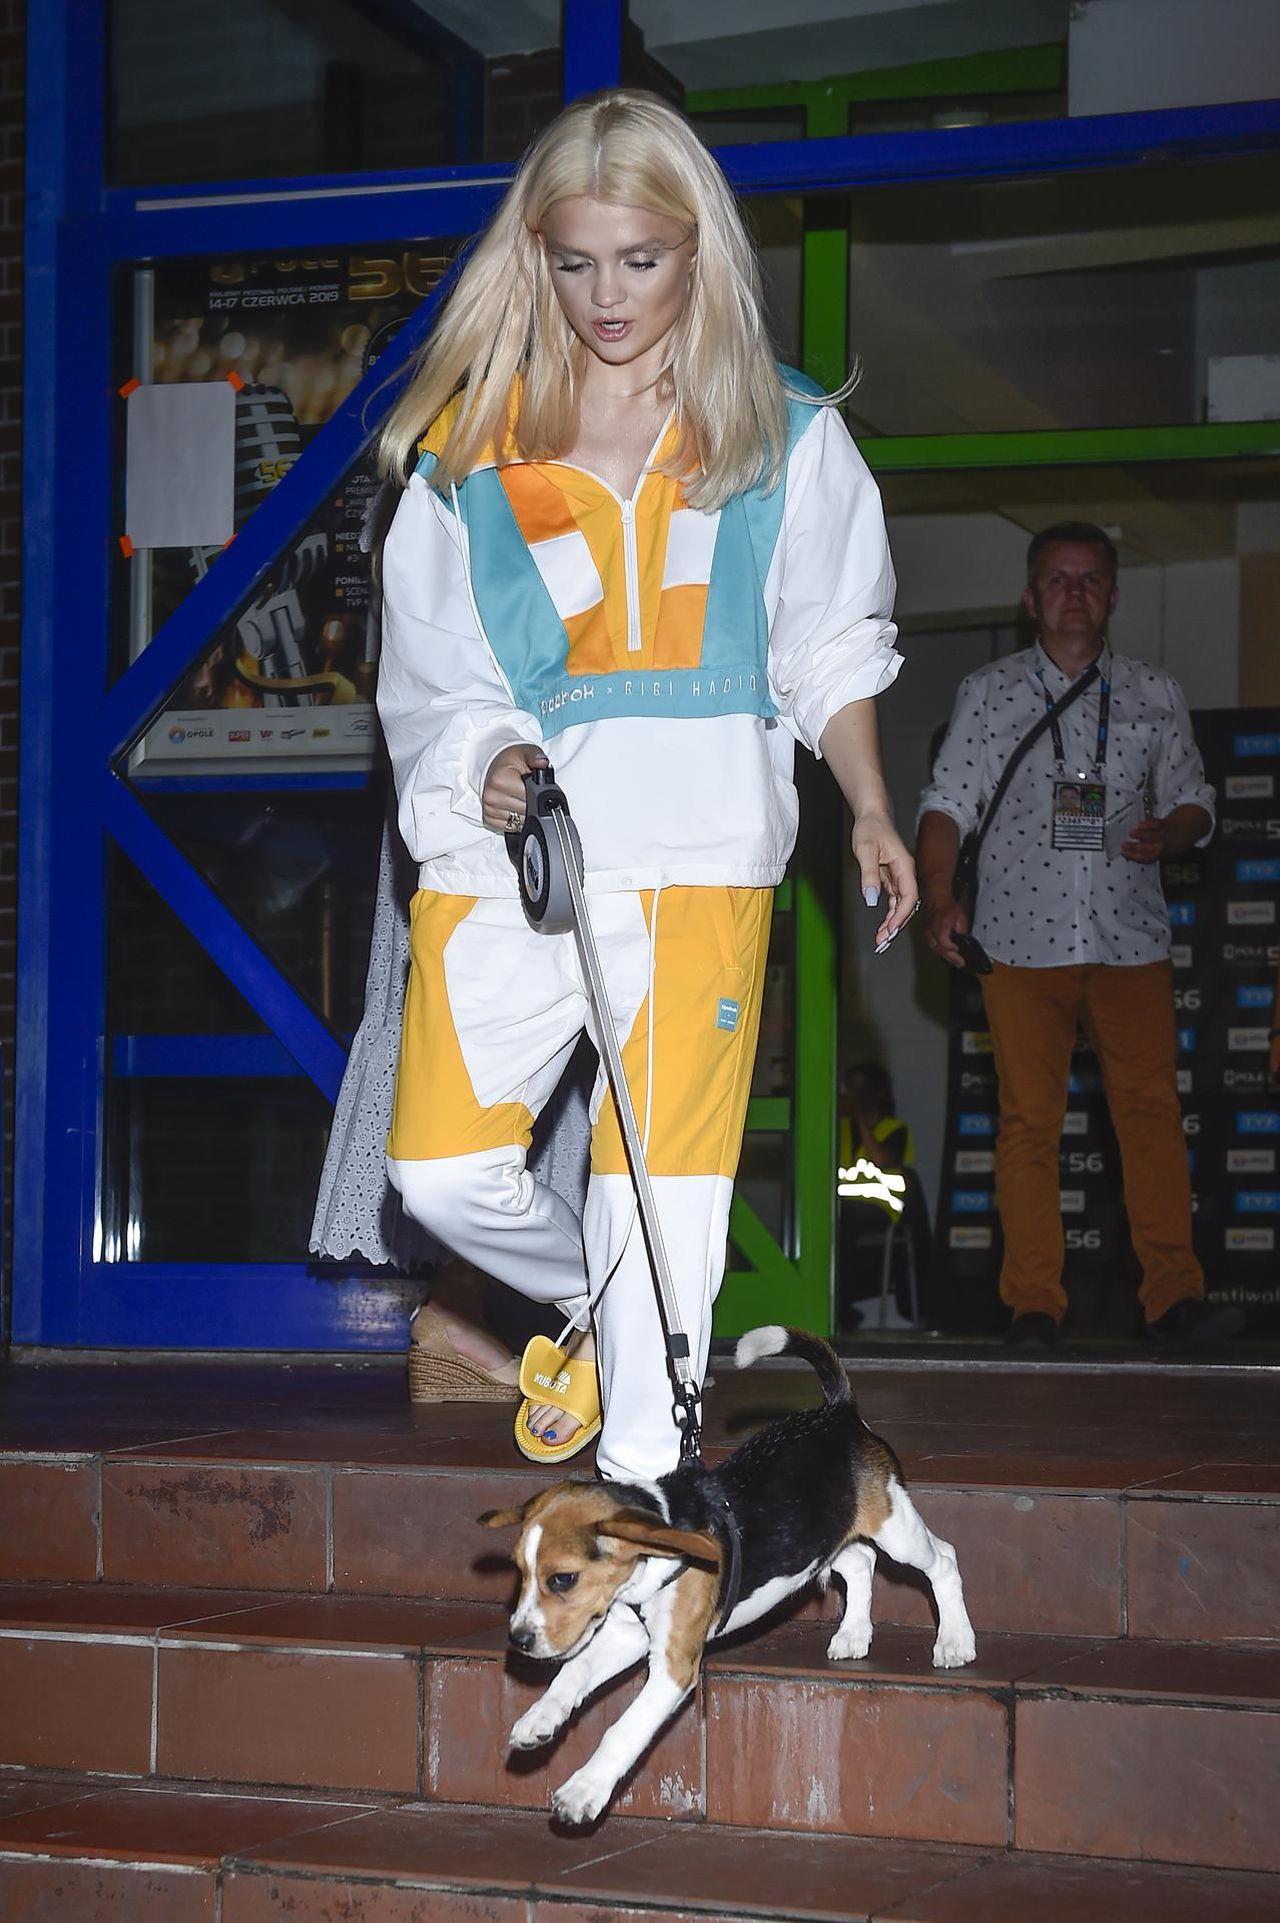 Margaret z psem za kulisami Festiwalu w Opolu